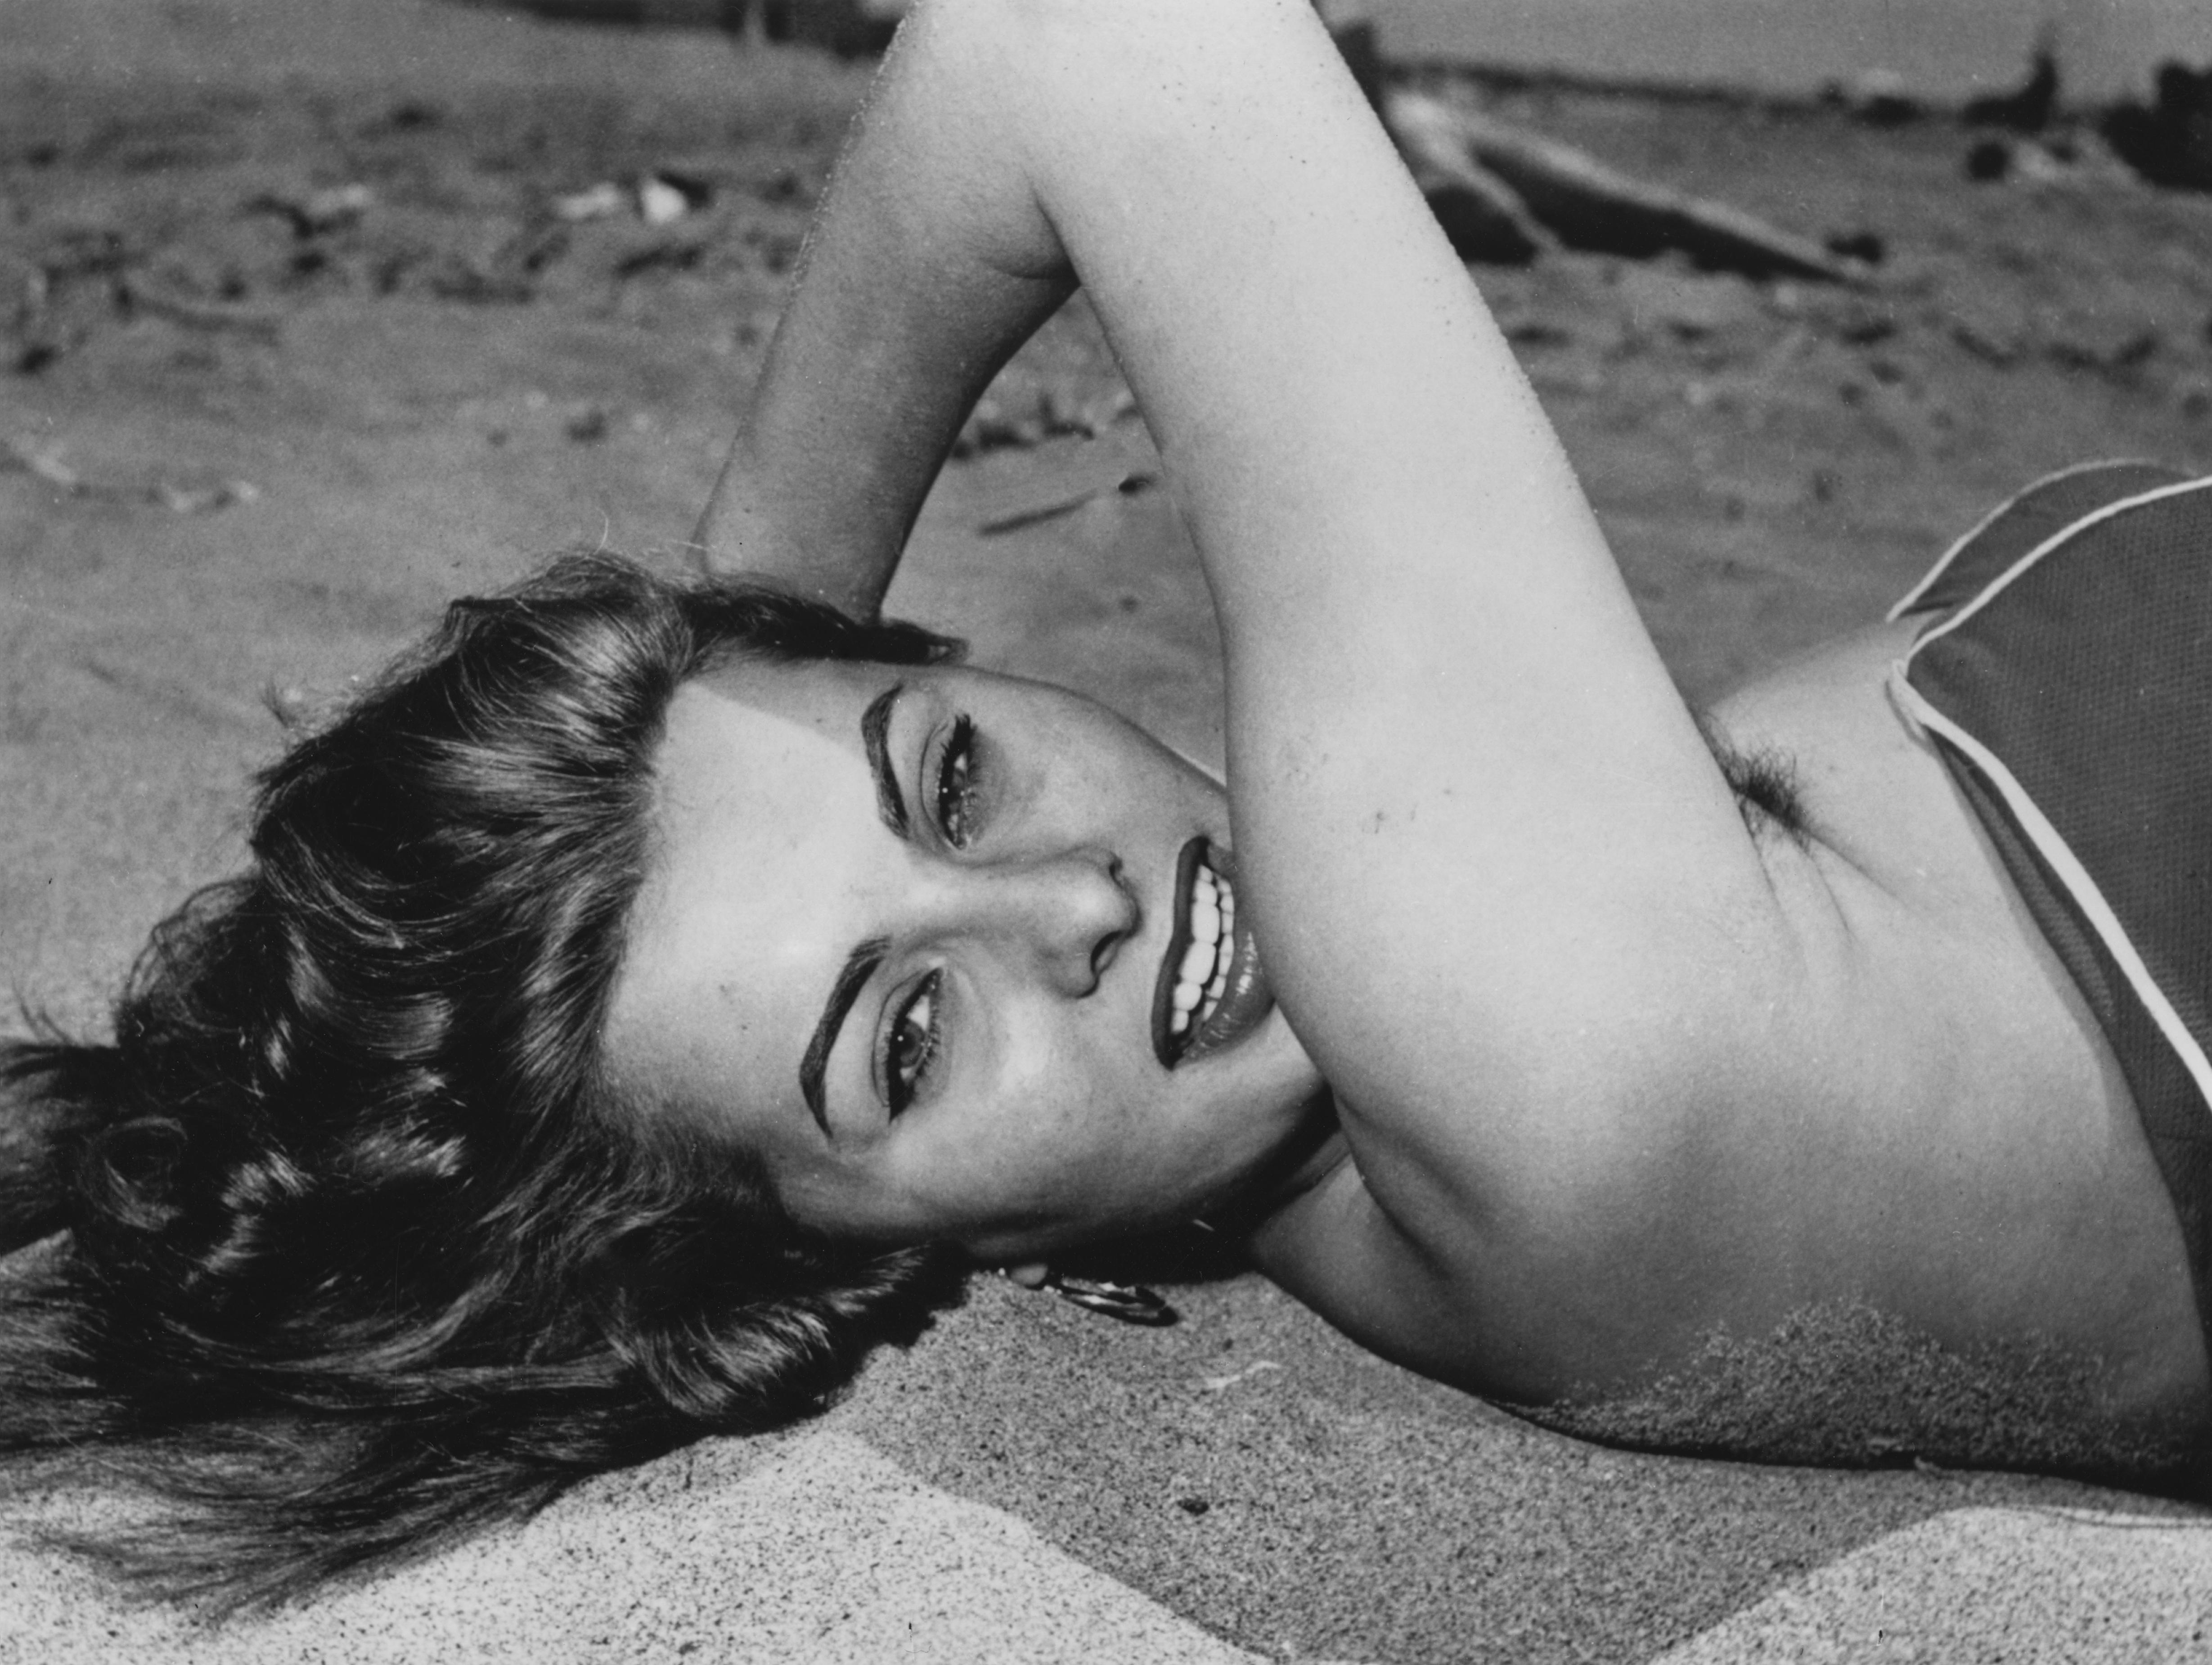 София Лорен, 1954